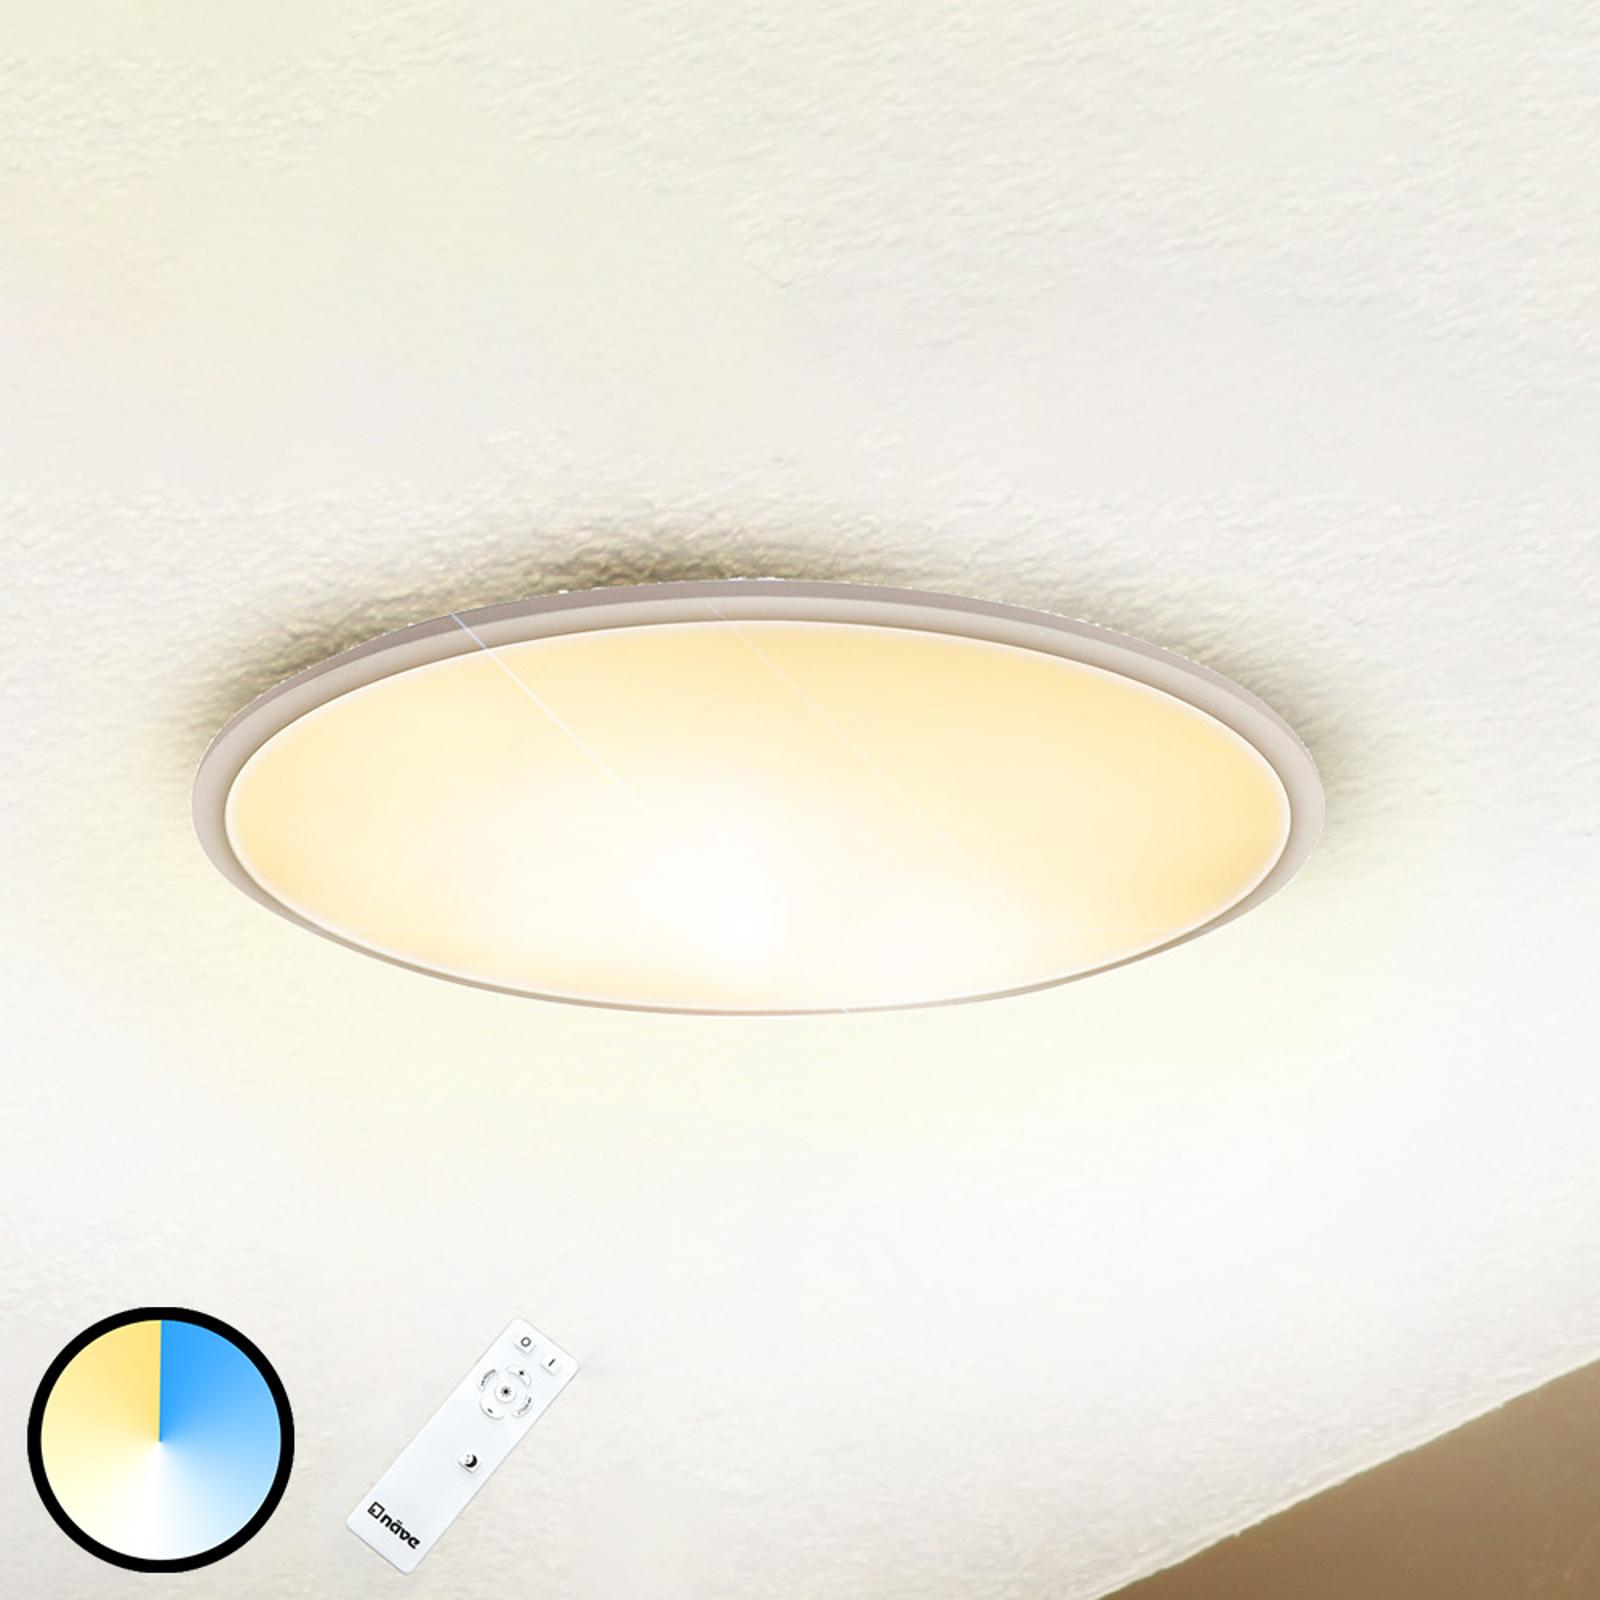 LED-kattovalaisin Sorrent, soikea 60 cm x 30 cm